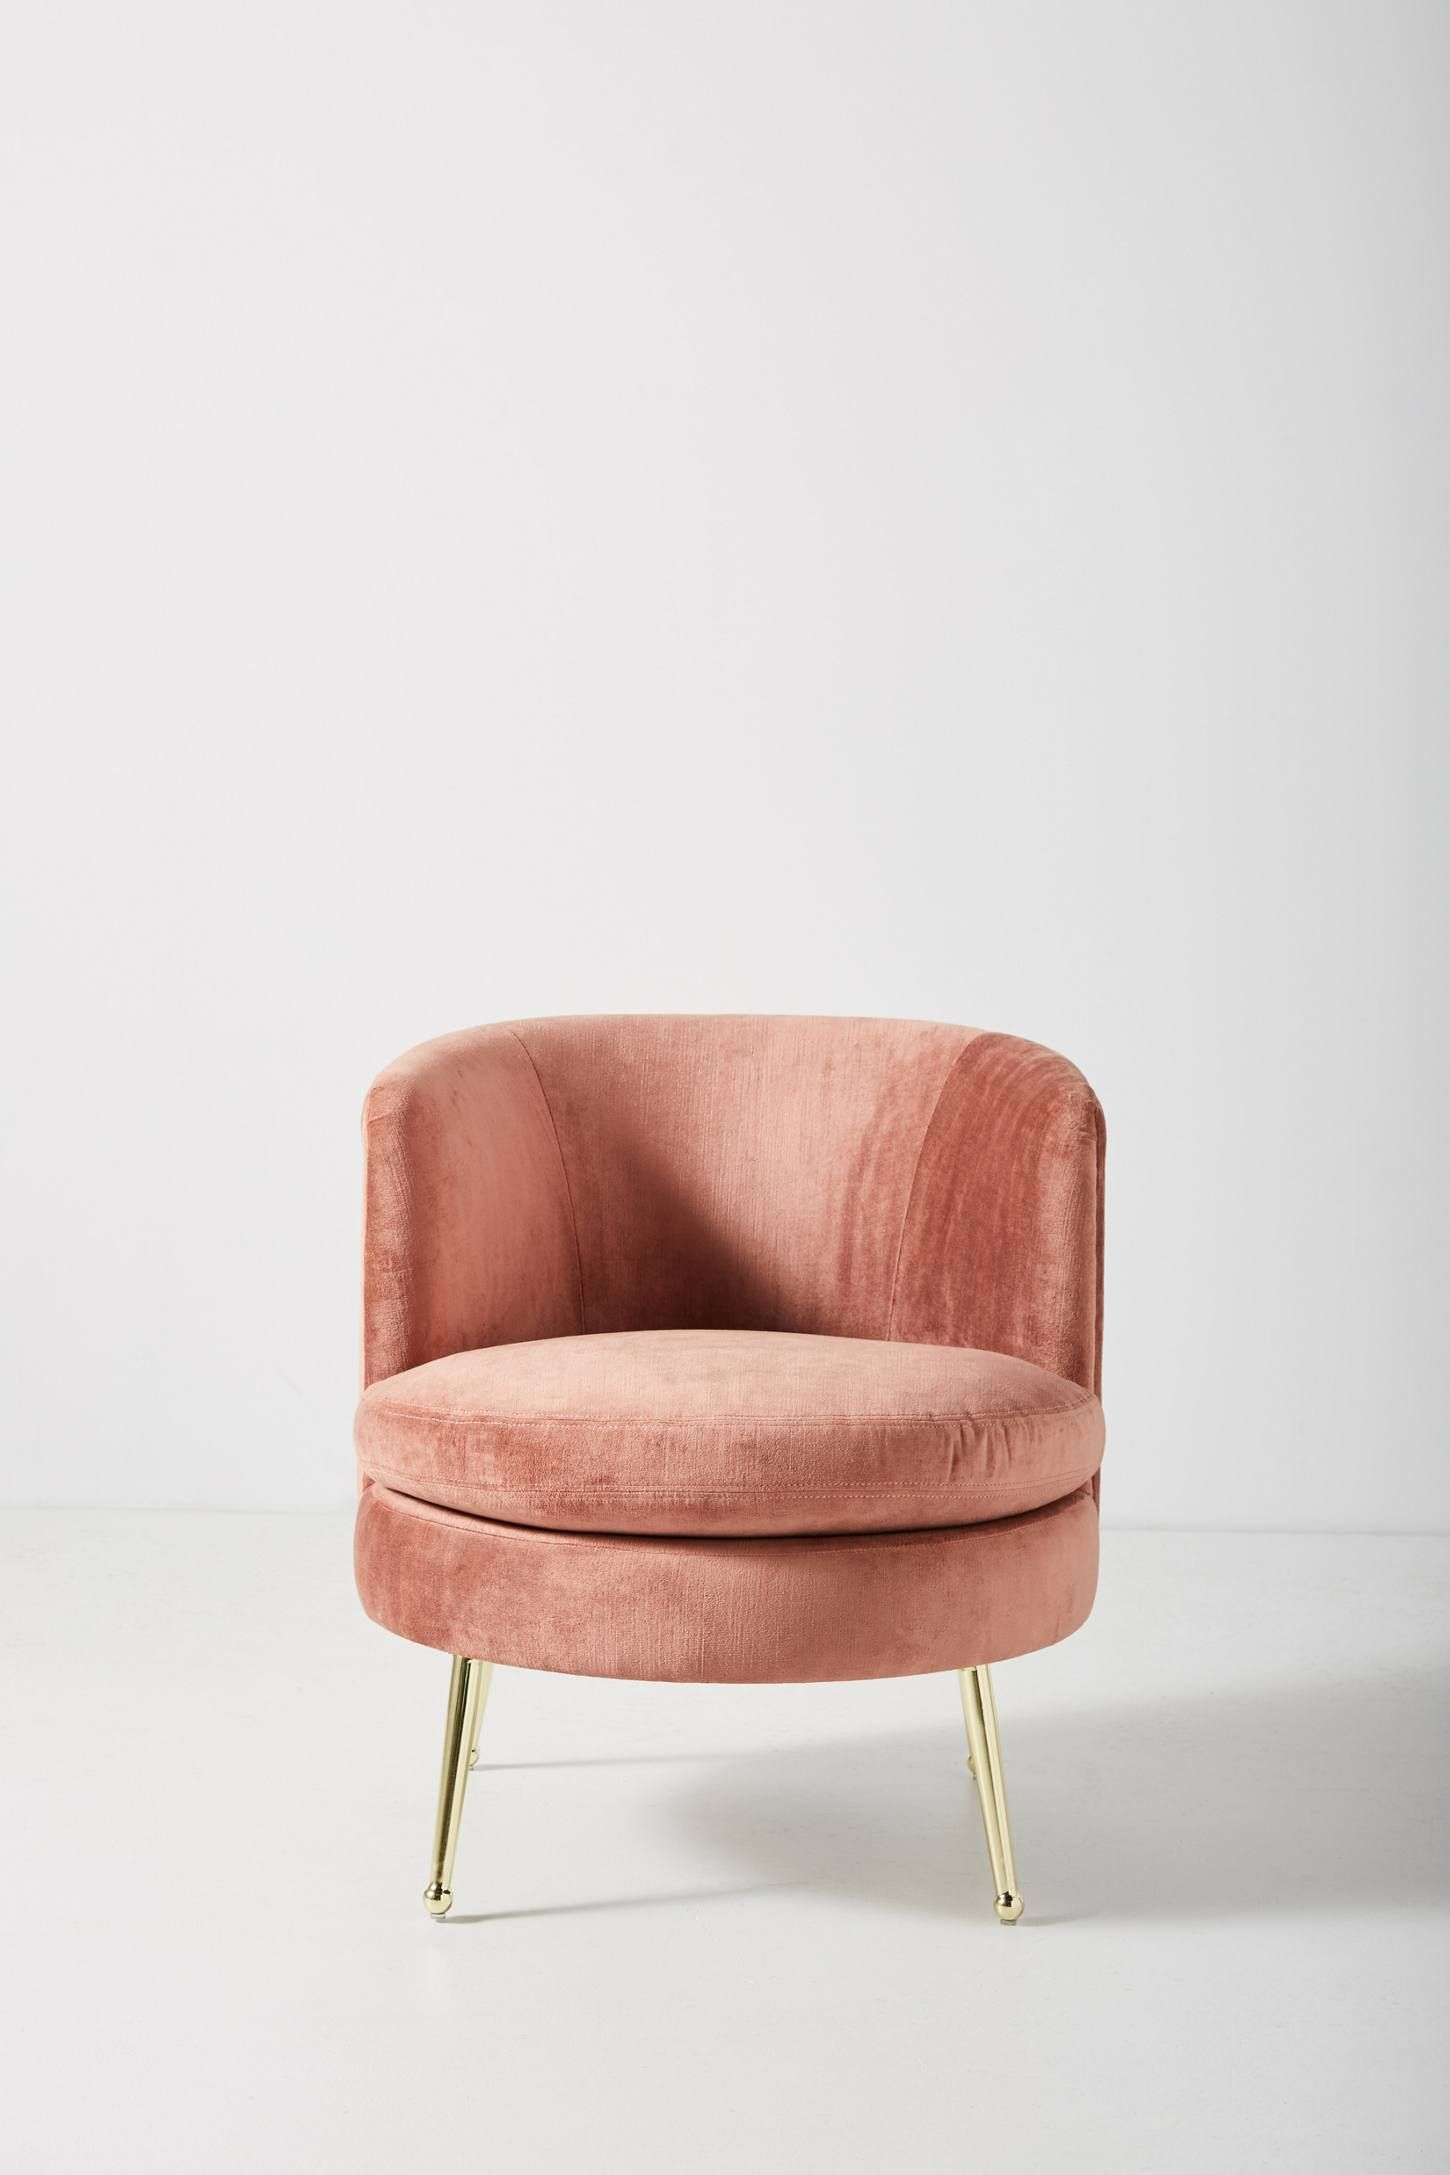 Australia Ikea office chair, Ikea office, Swivel chair